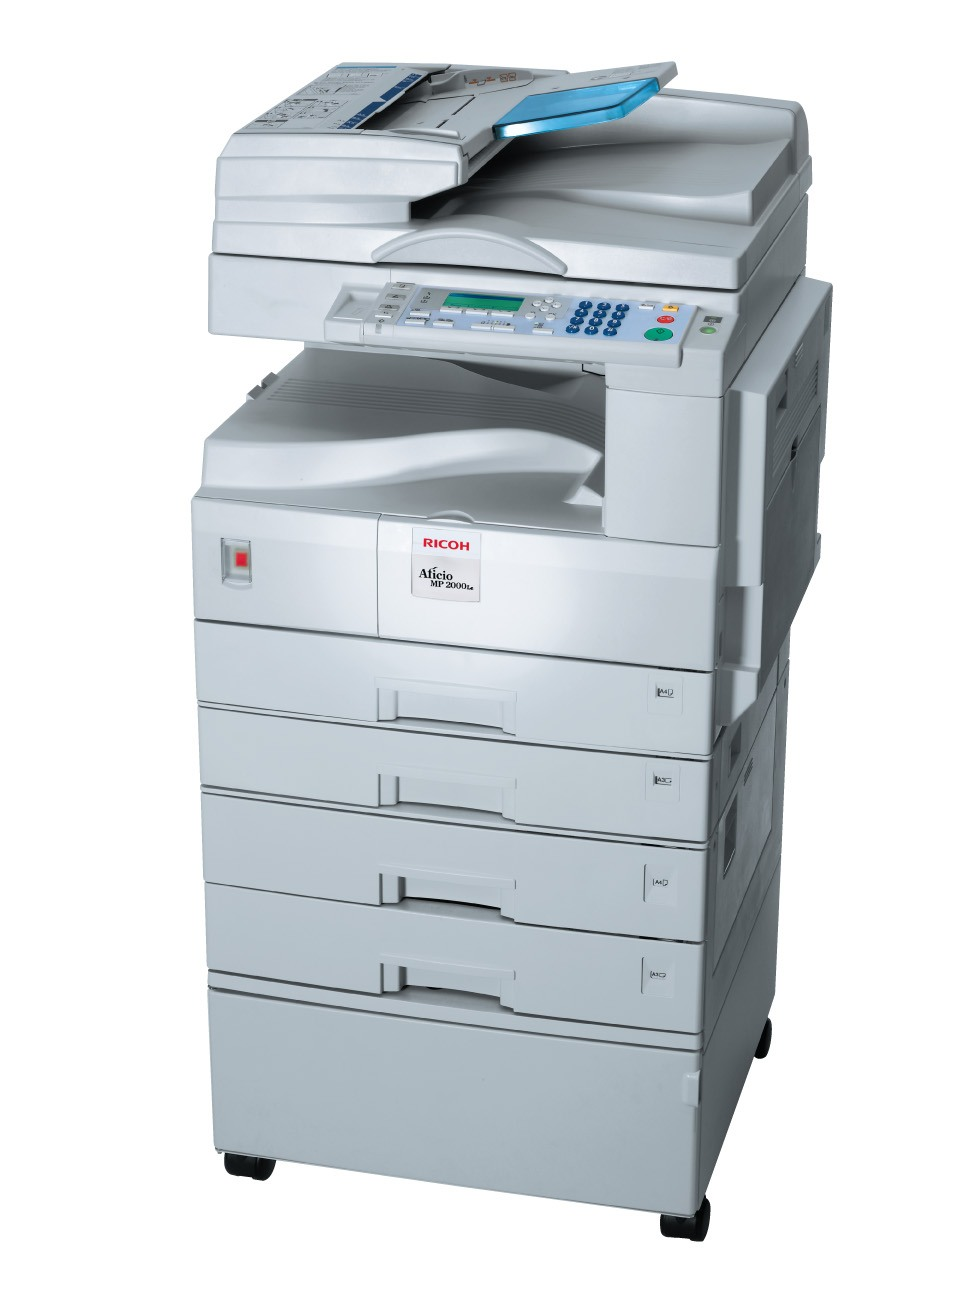 Ricoh Aficio MP 1600